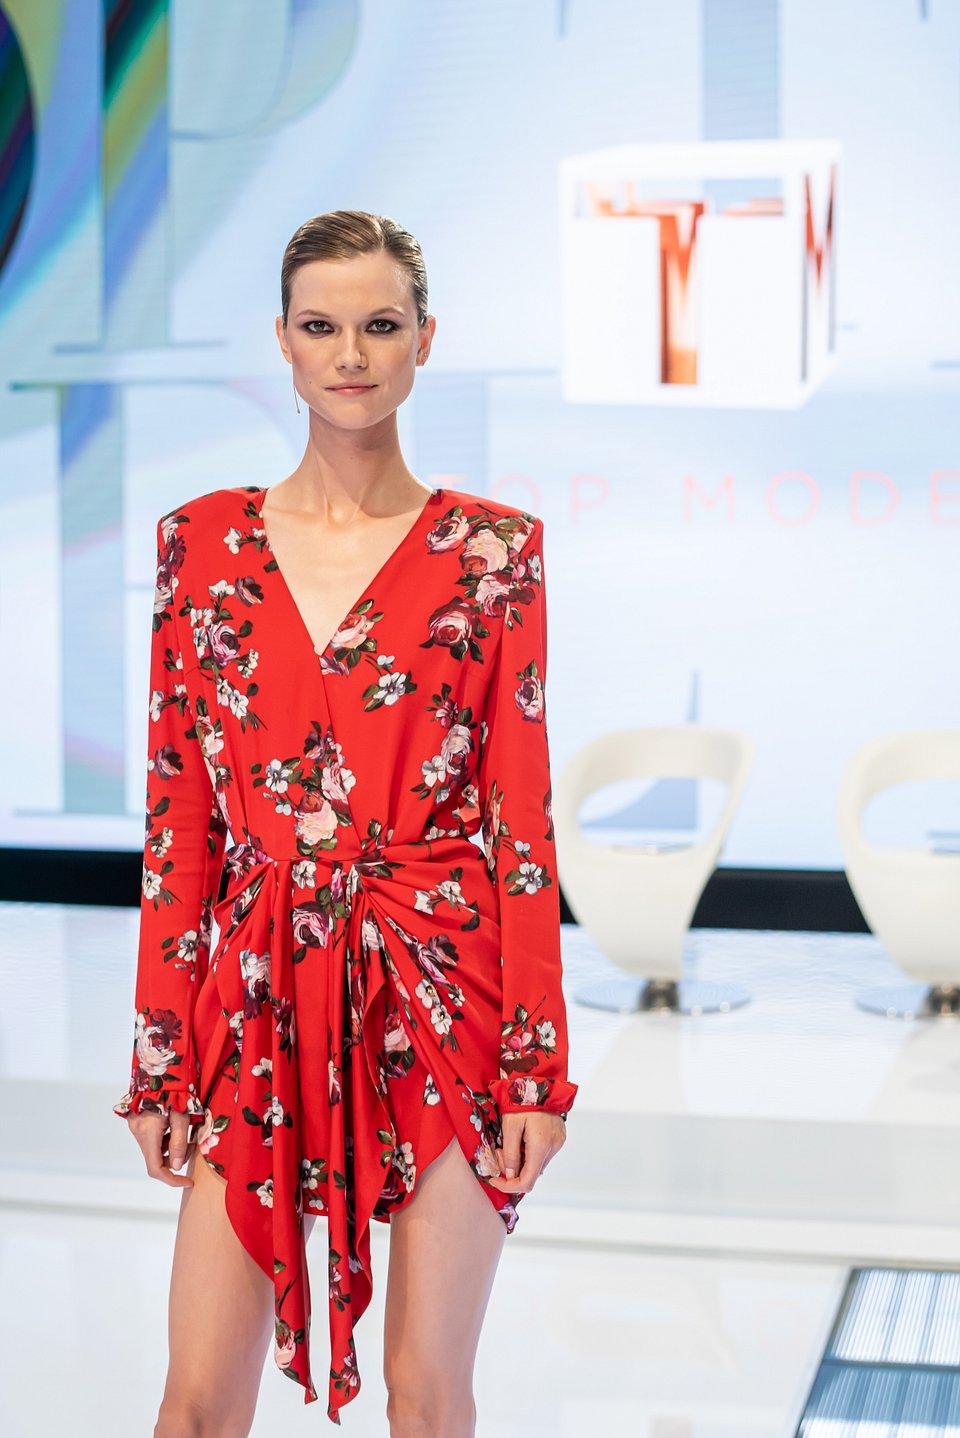 Kasia Struss, fot.: TVN/ Piotr Filutowski